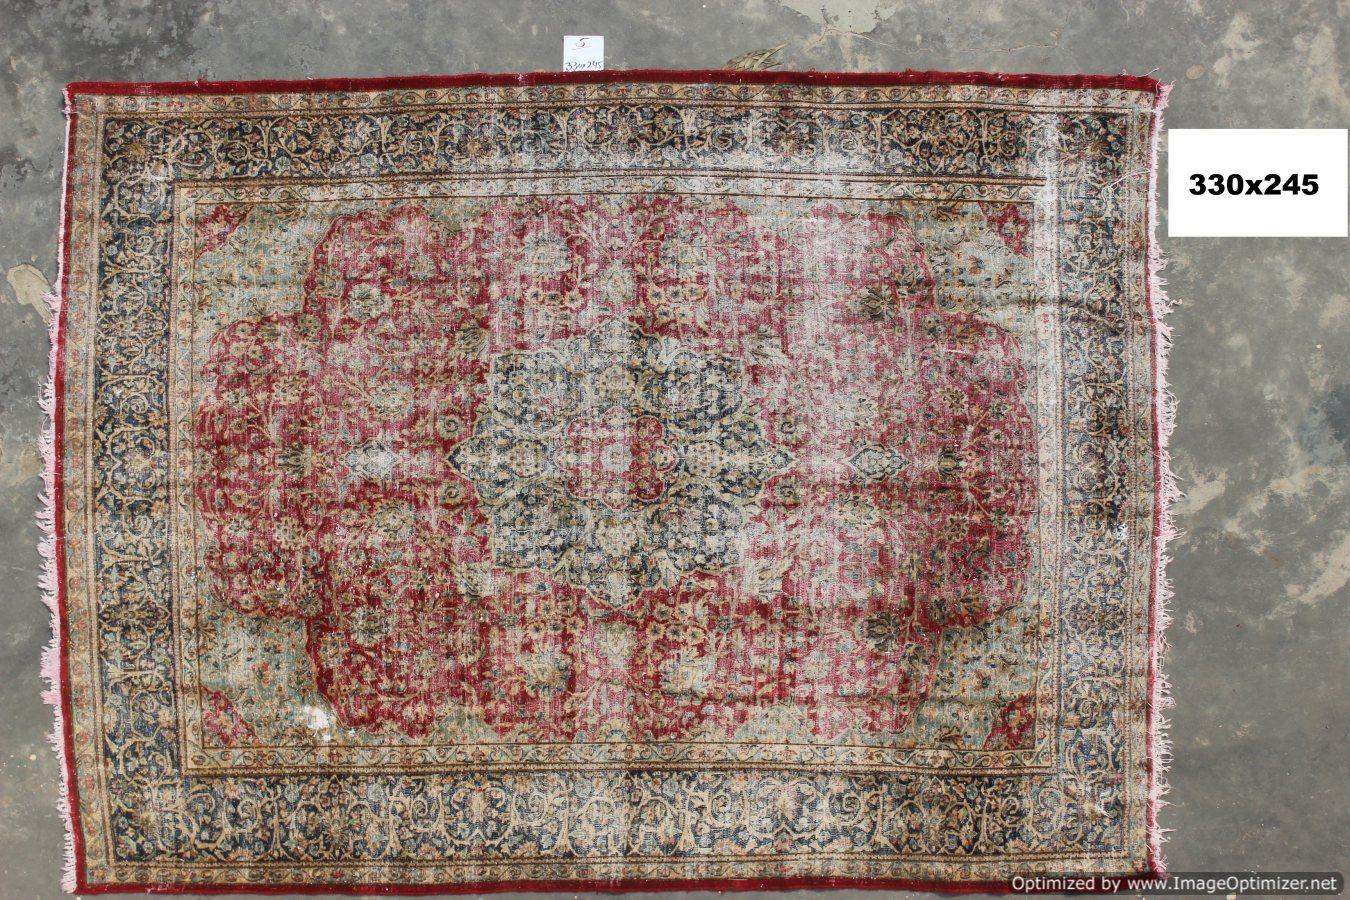 Vintage recoloured perzisch tapijt 05B   (330cm x 245cm)